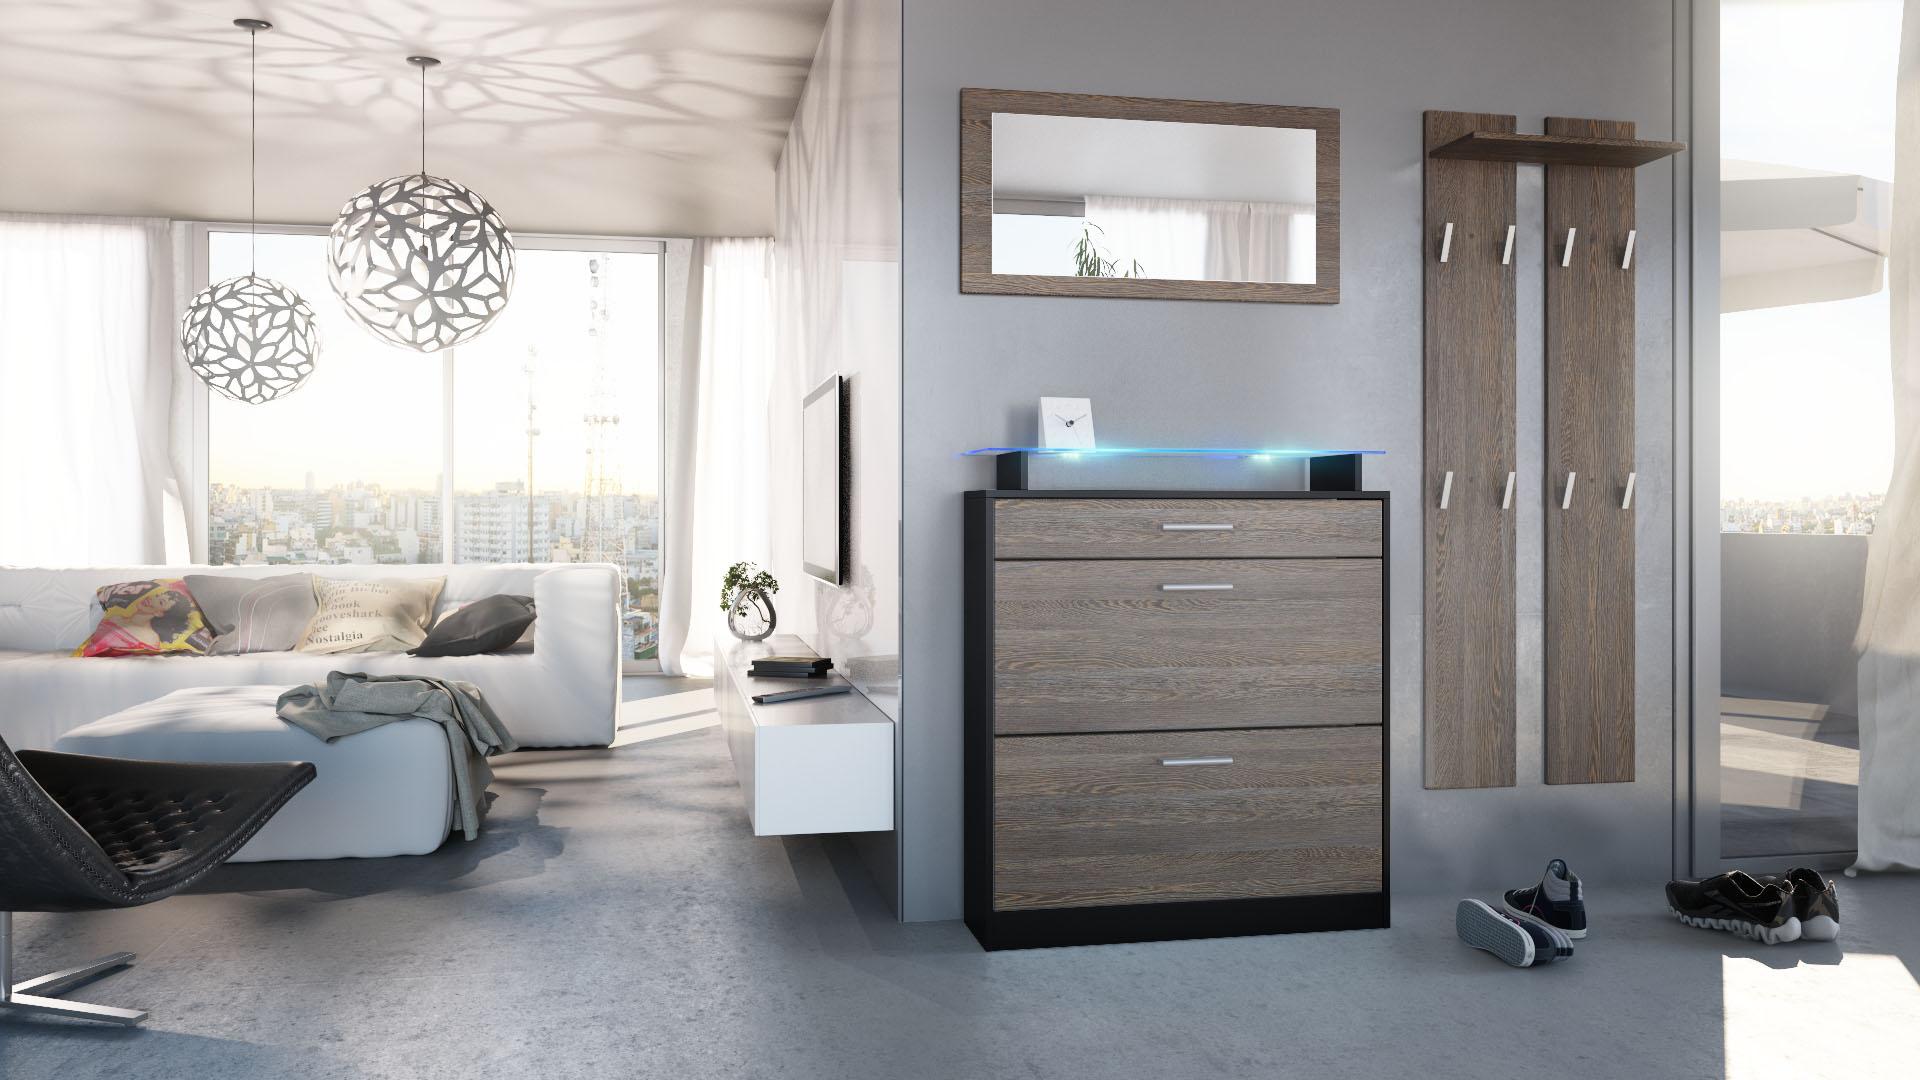 garderobenset garderobe paneel schuhschrank spiegel loret. Black Bedroom Furniture Sets. Home Design Ideas